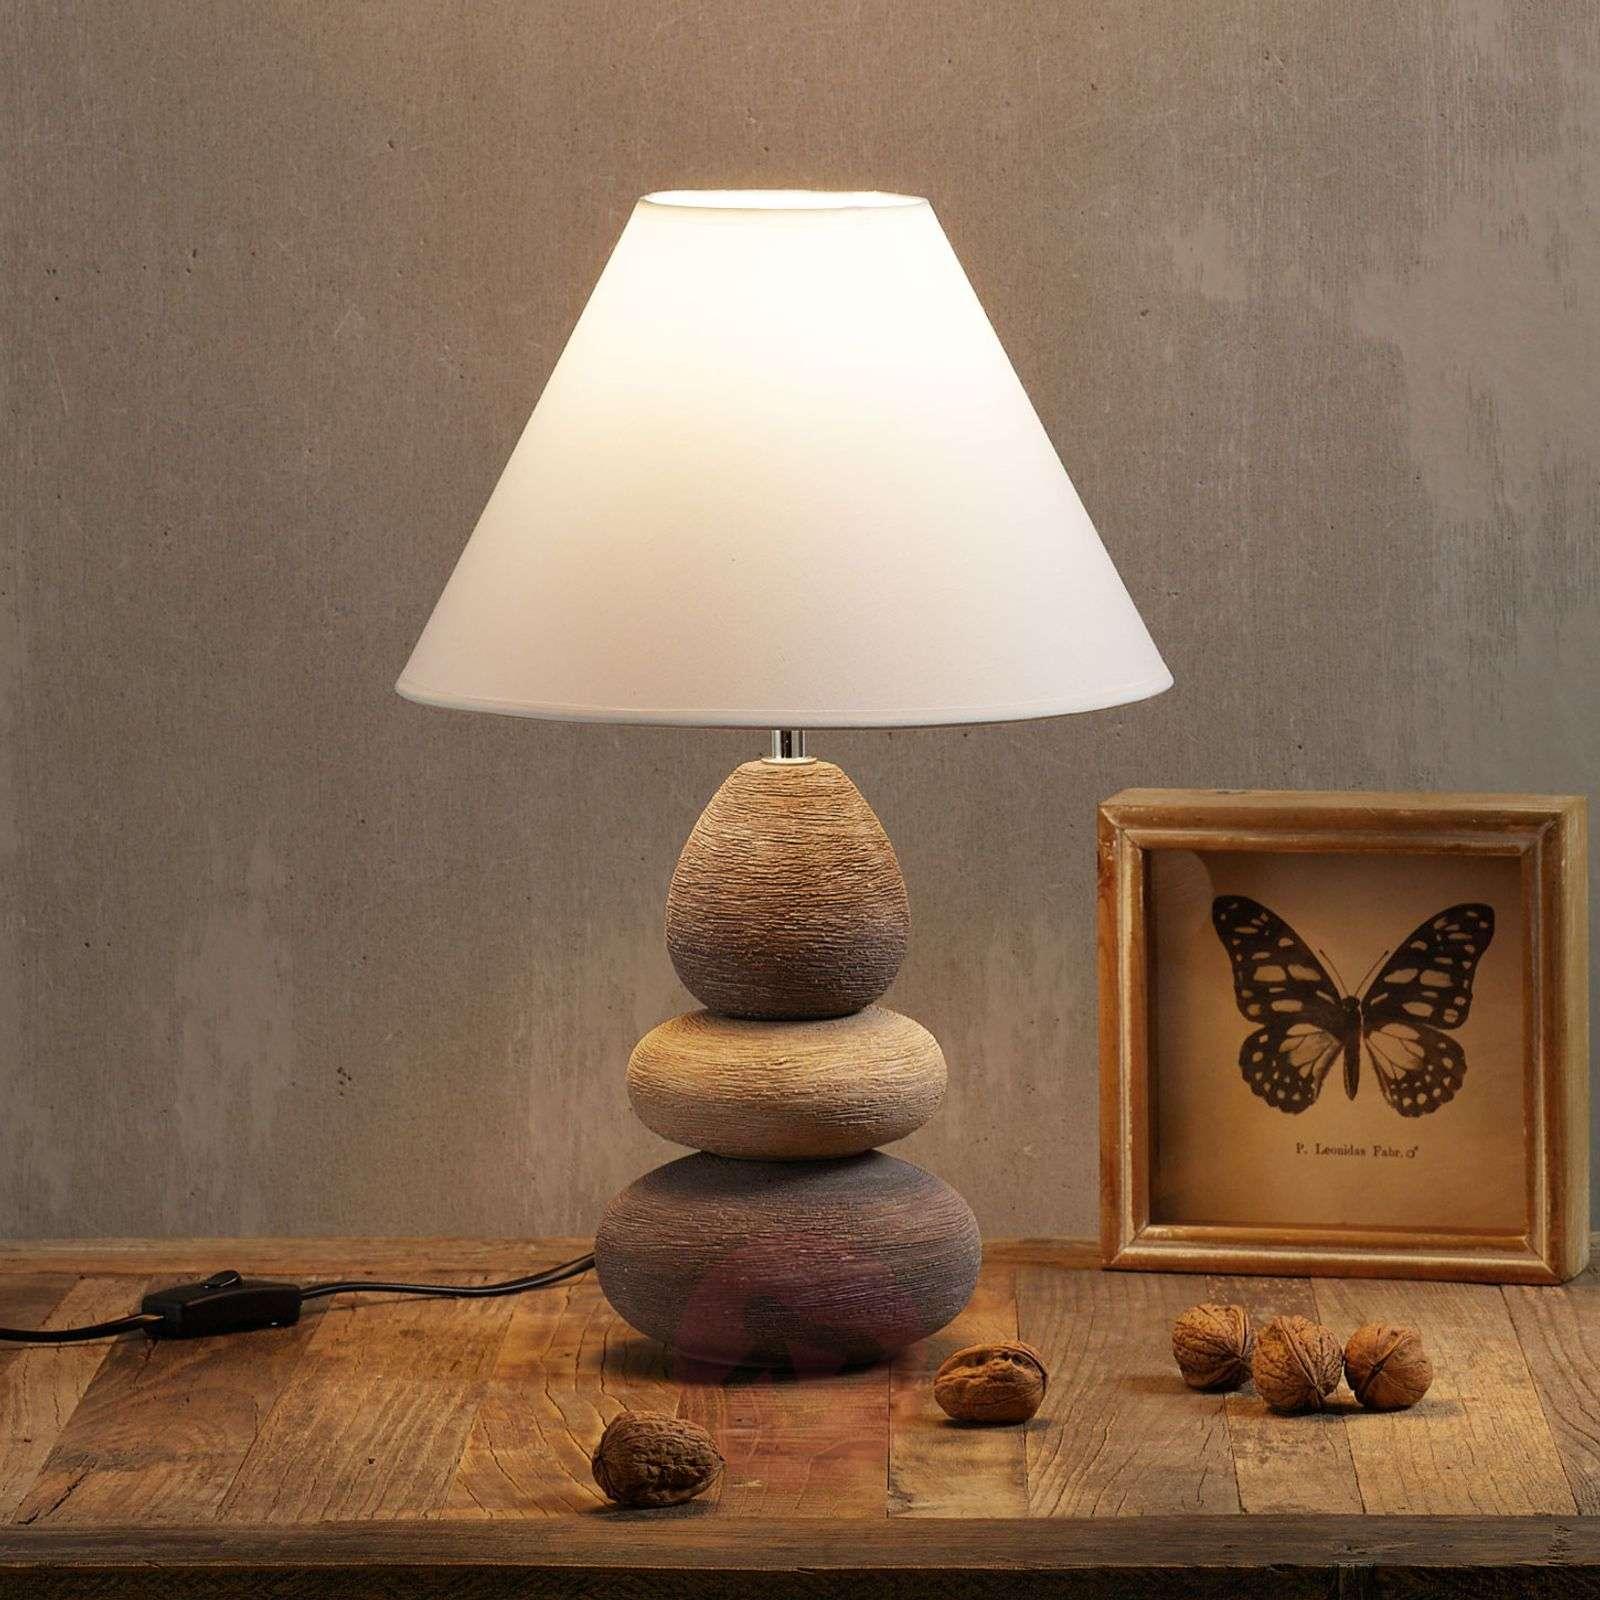 Original table lamp BALON brown/beige-4580591-01